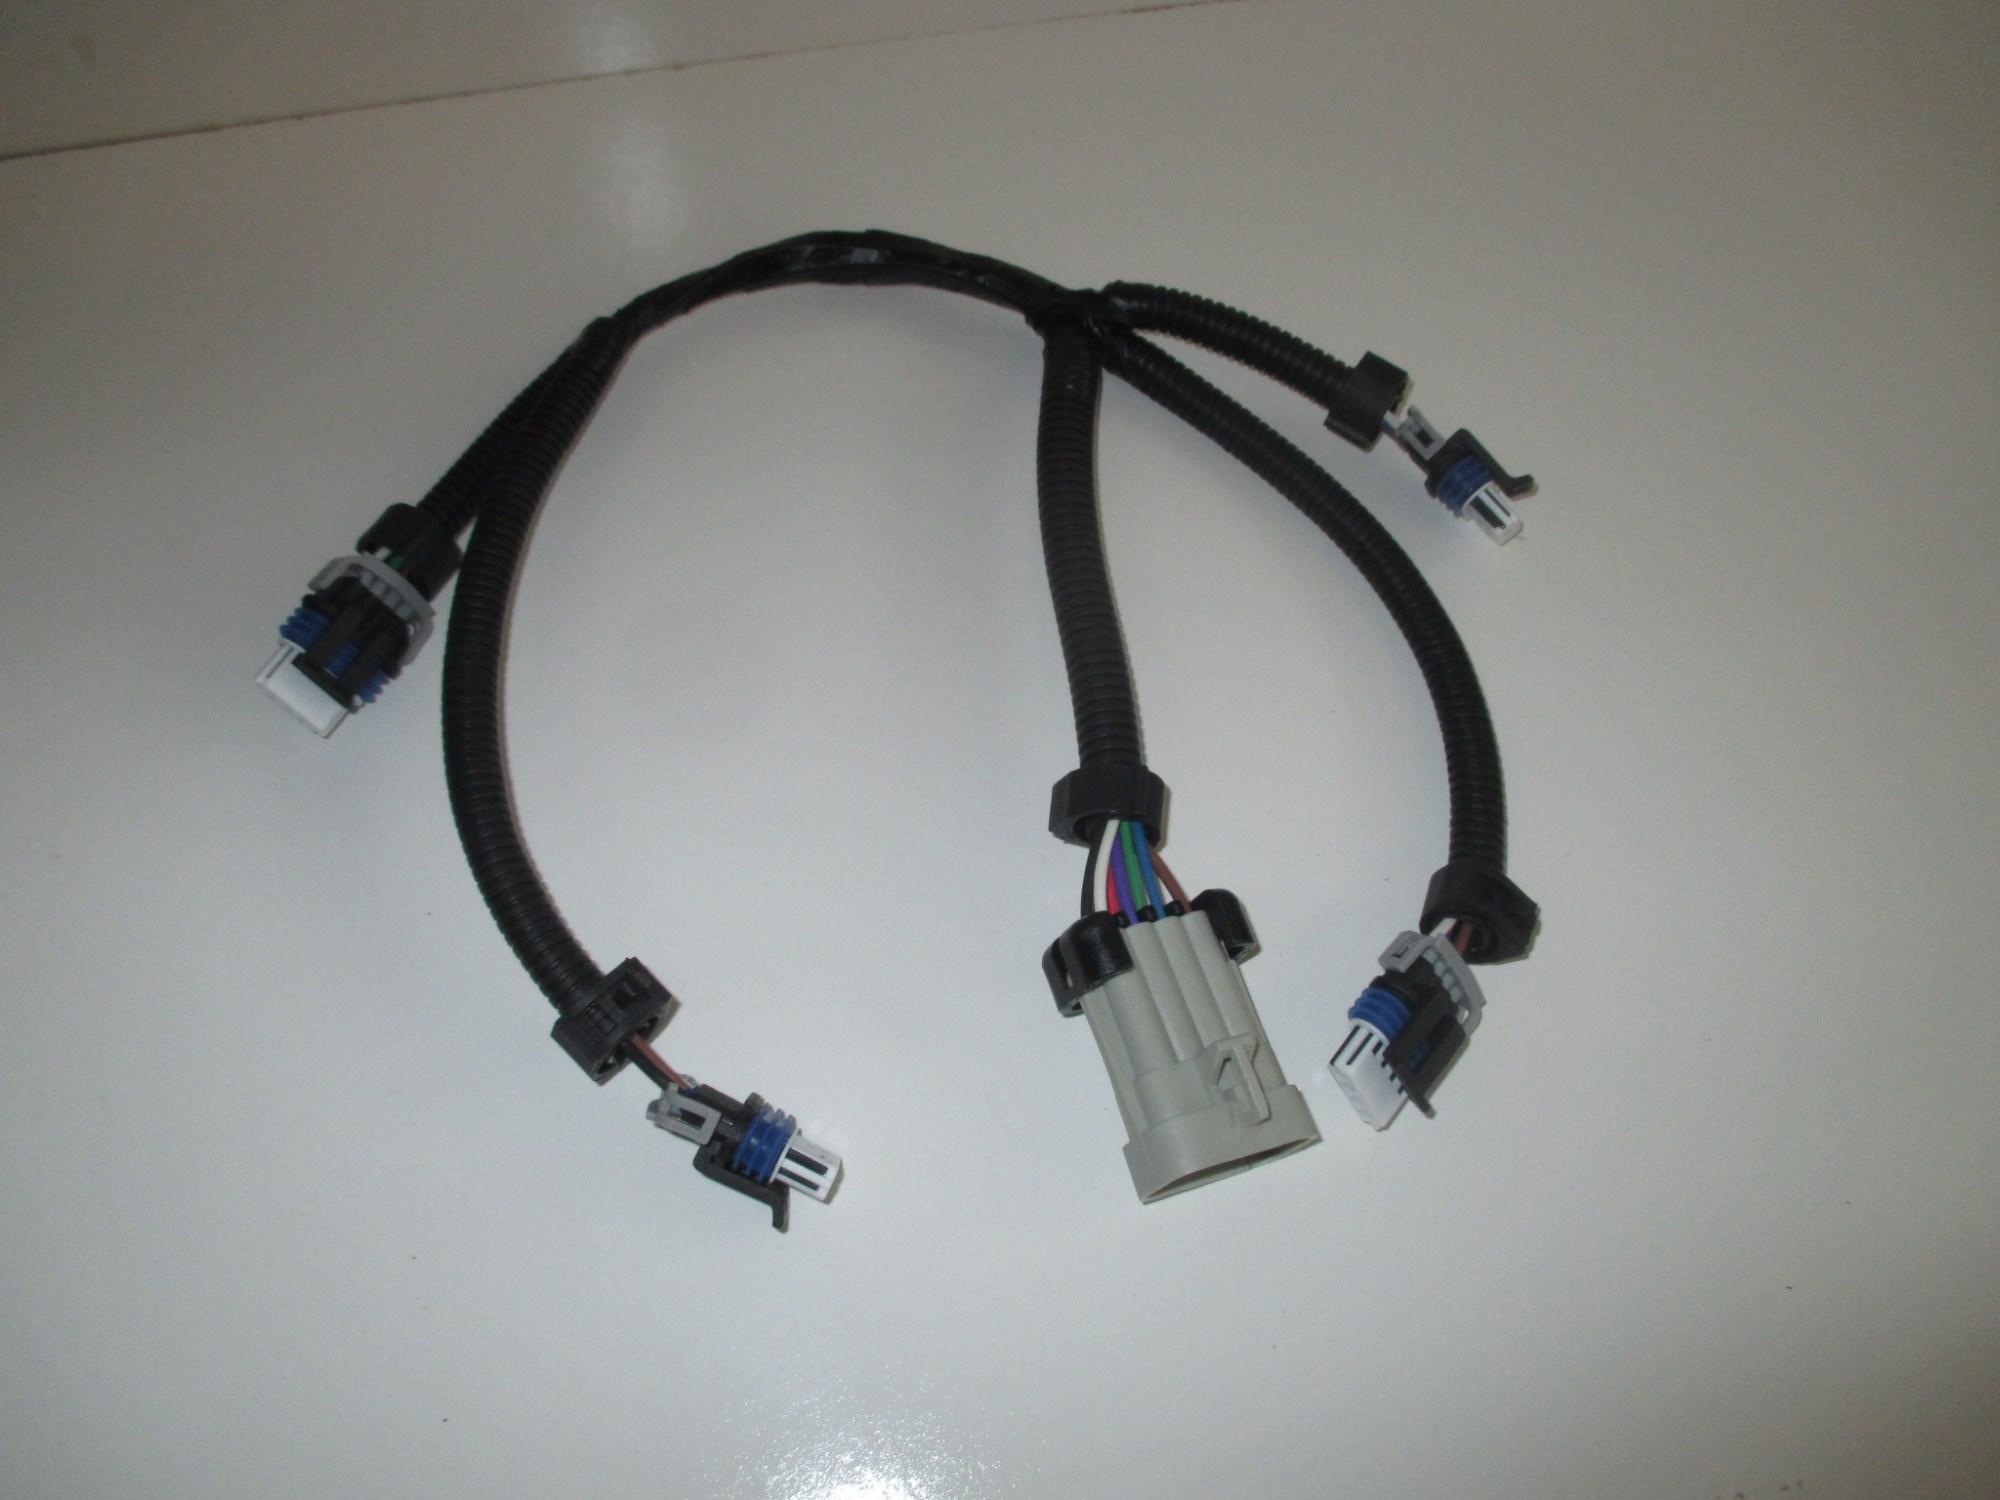 hight resolution of set of 2 gm ignition coil harnesses lq9 lq4 ls2 ls7 lsx d585 d581